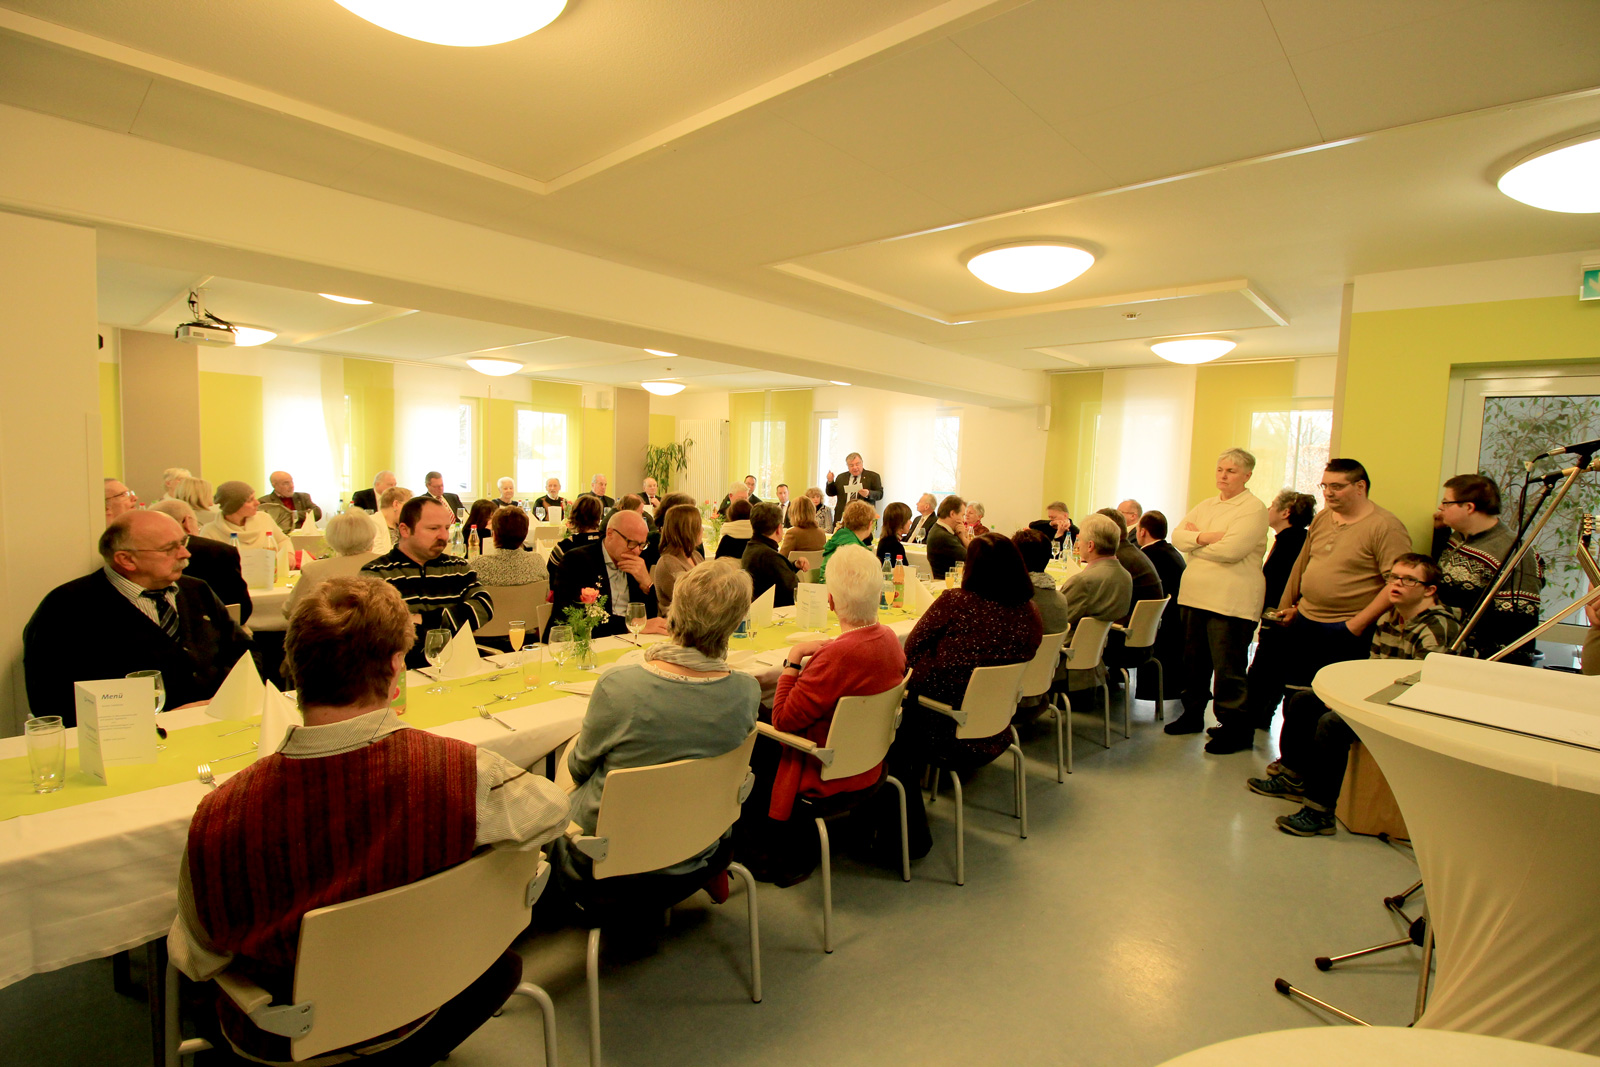 Viele Gäste aus der Lebenshilfe-Familie gratulierten dem allseits beliebten Jubilar Gerd Neumann.